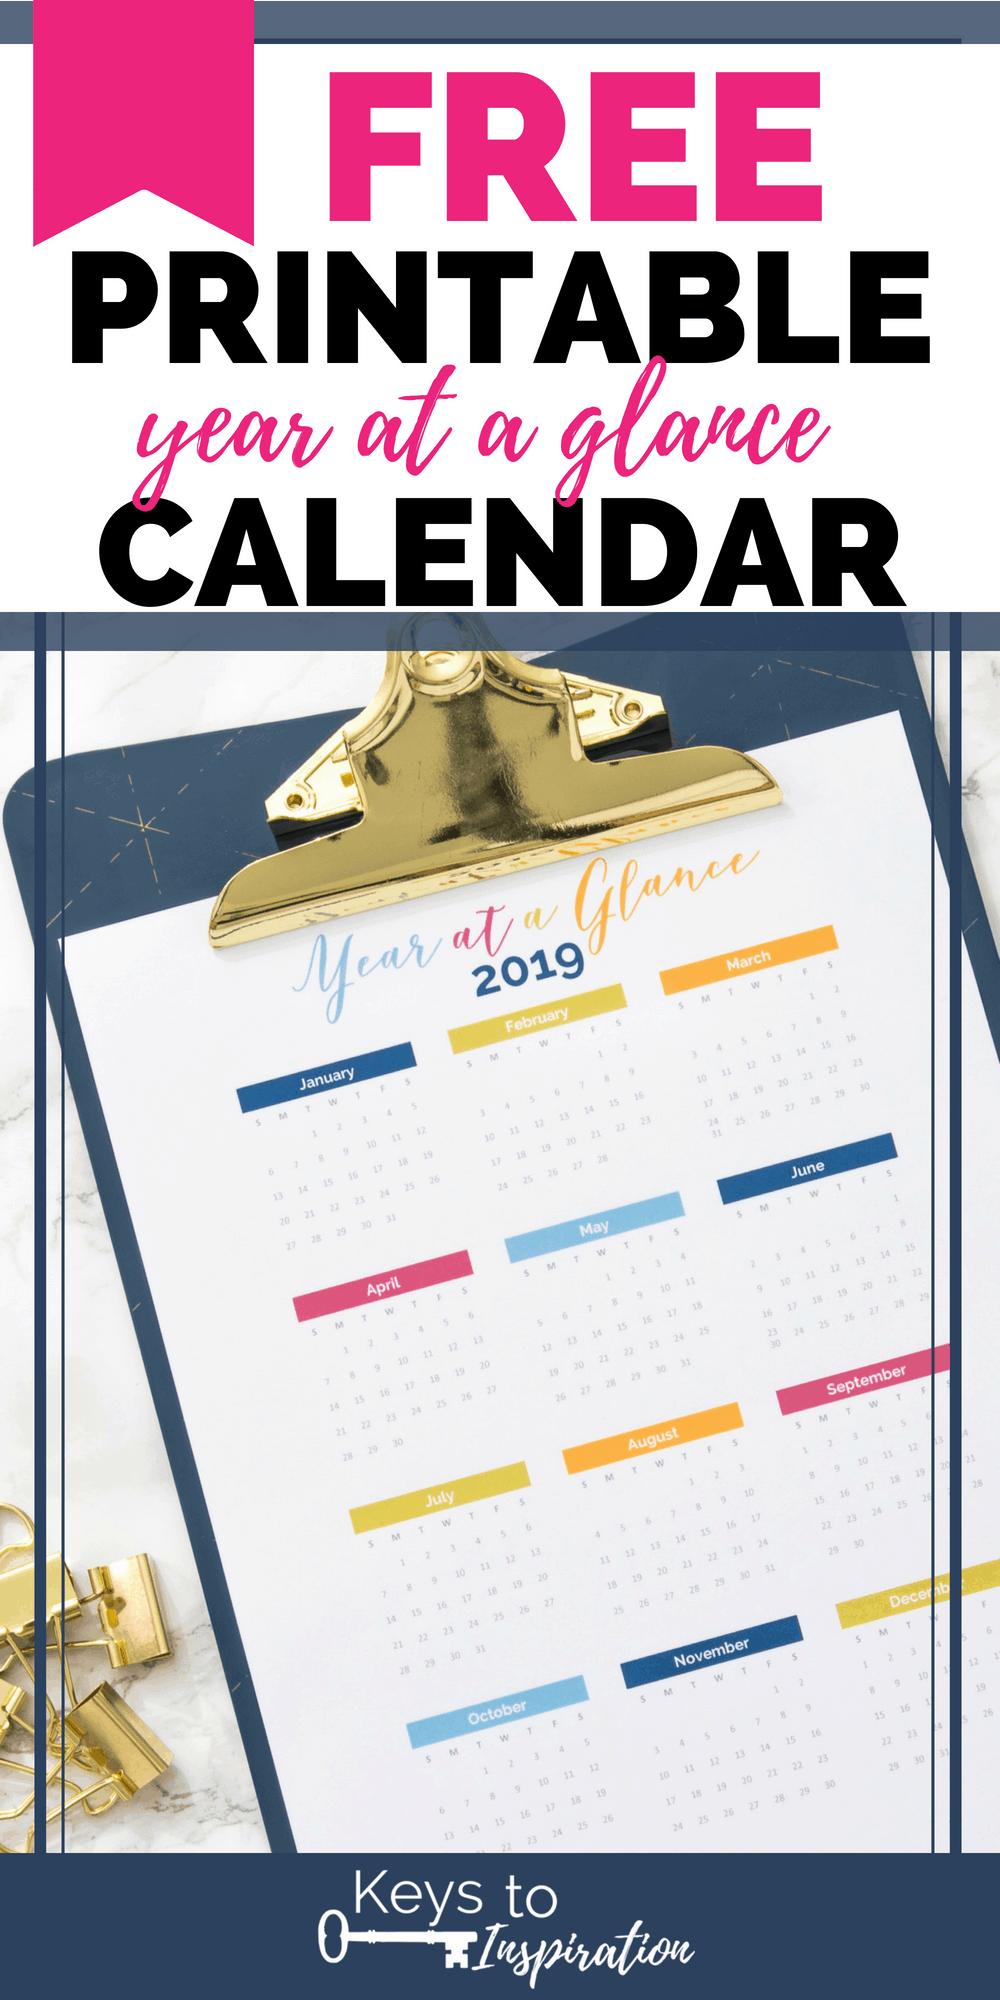 2019 year at a glance calendar on a clipboard